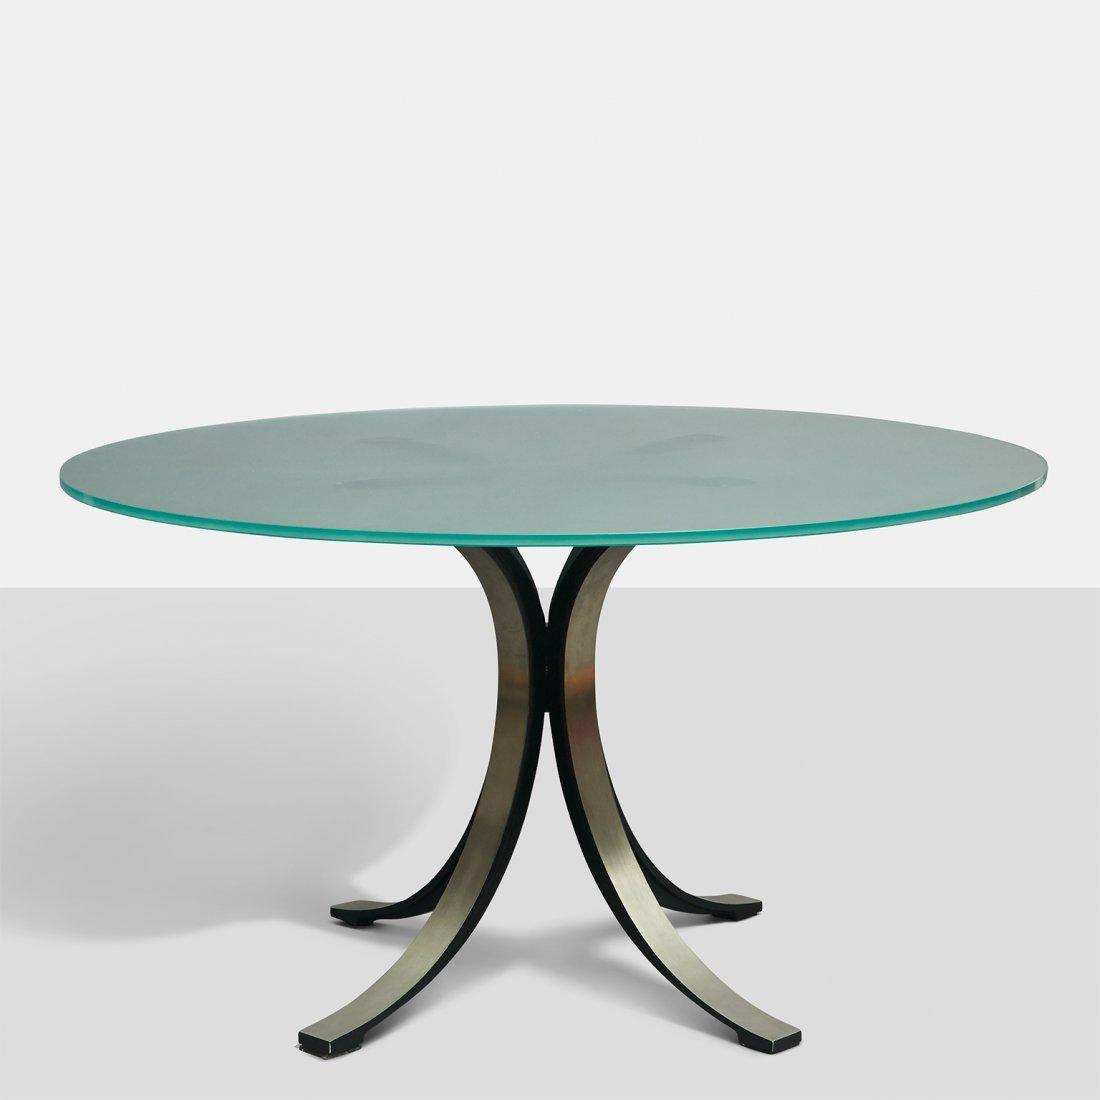 Osvaldo Borsani, Dining Table